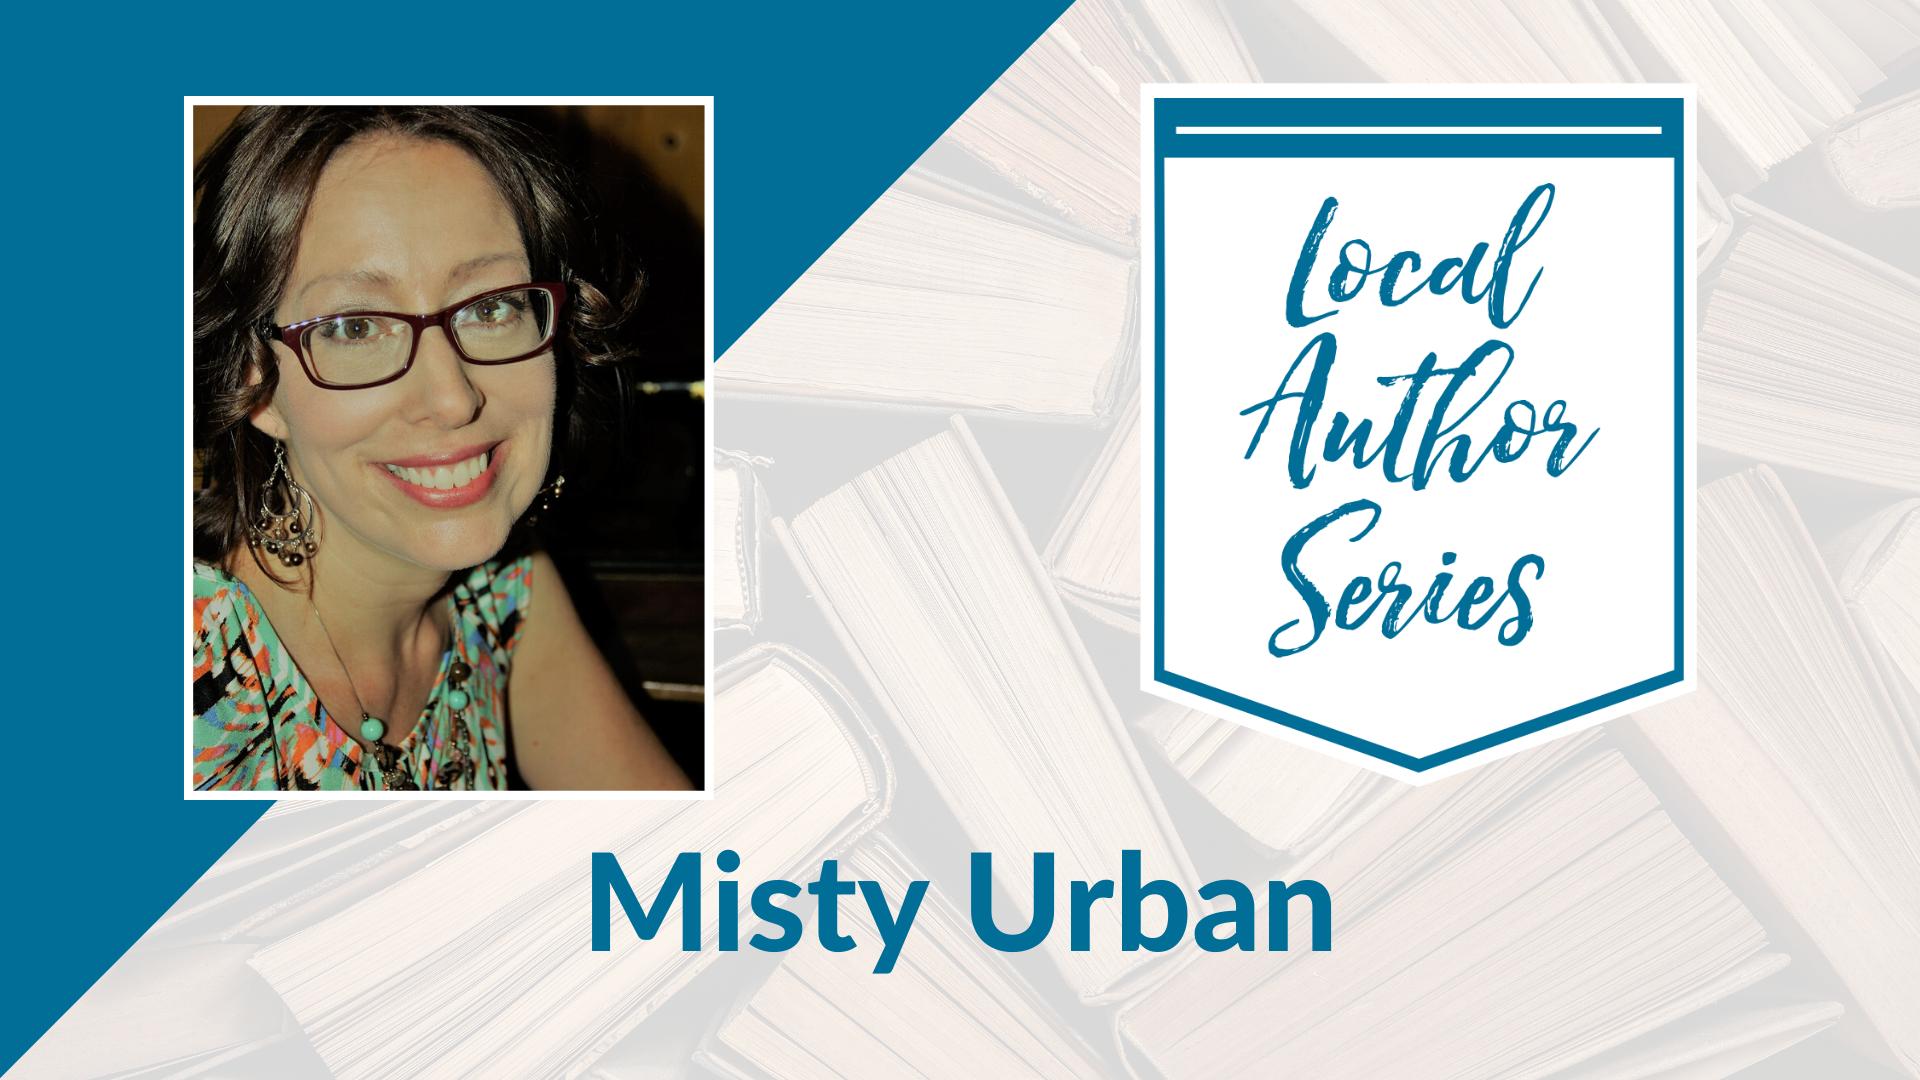 Local Author Series: Misty Urban